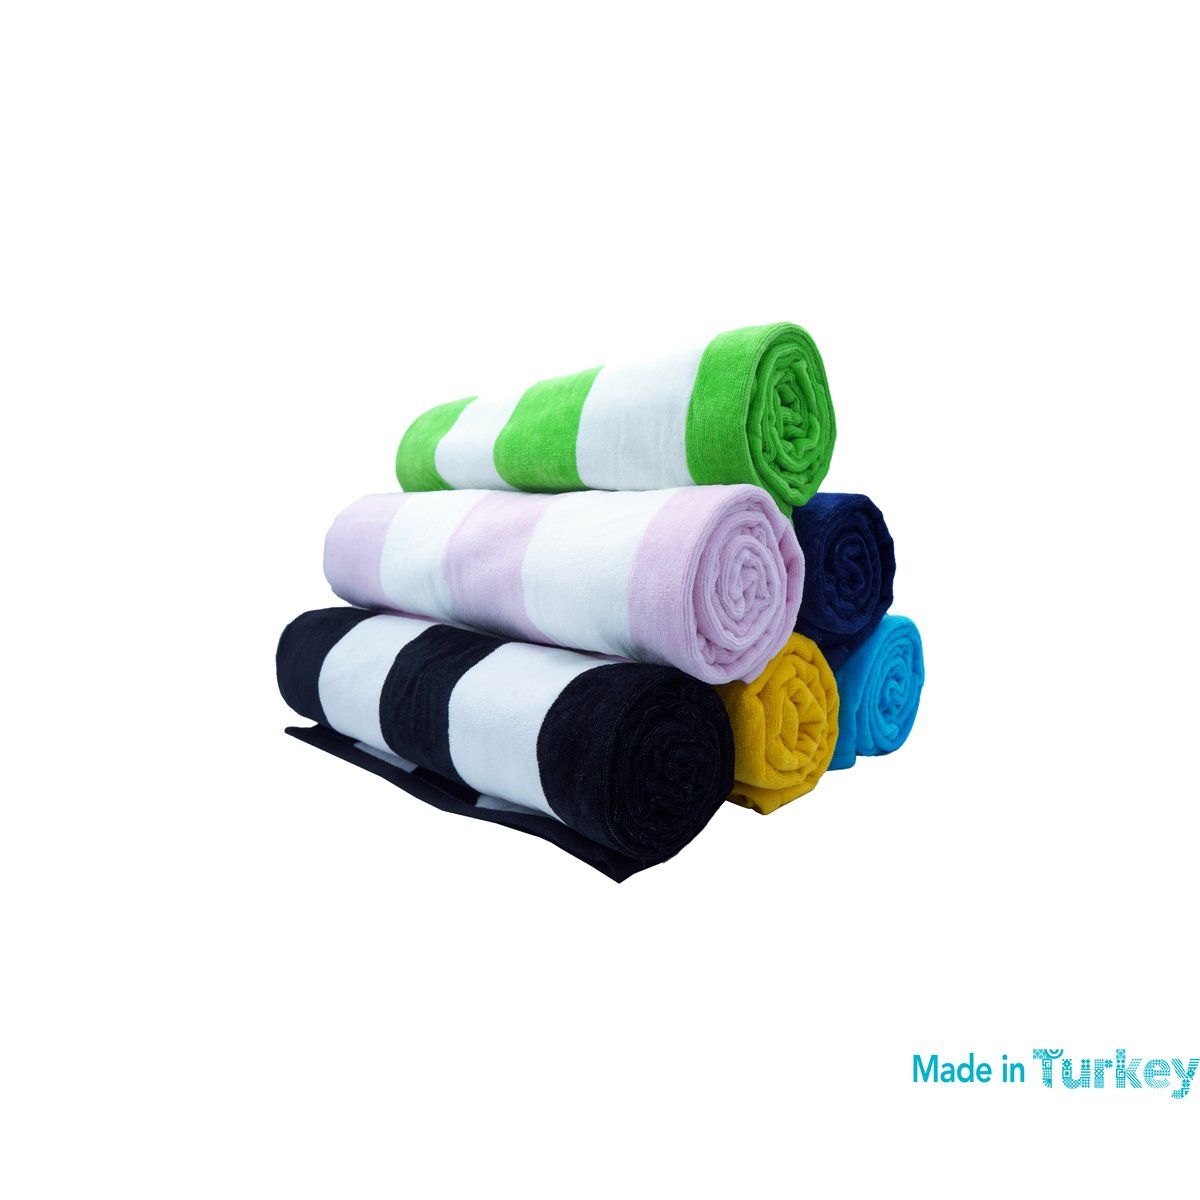 Pool 35x 60 Cabana Stripe Towel for Beach Black anatolian X-Large Bath 100/% Cotton Made in Turkey